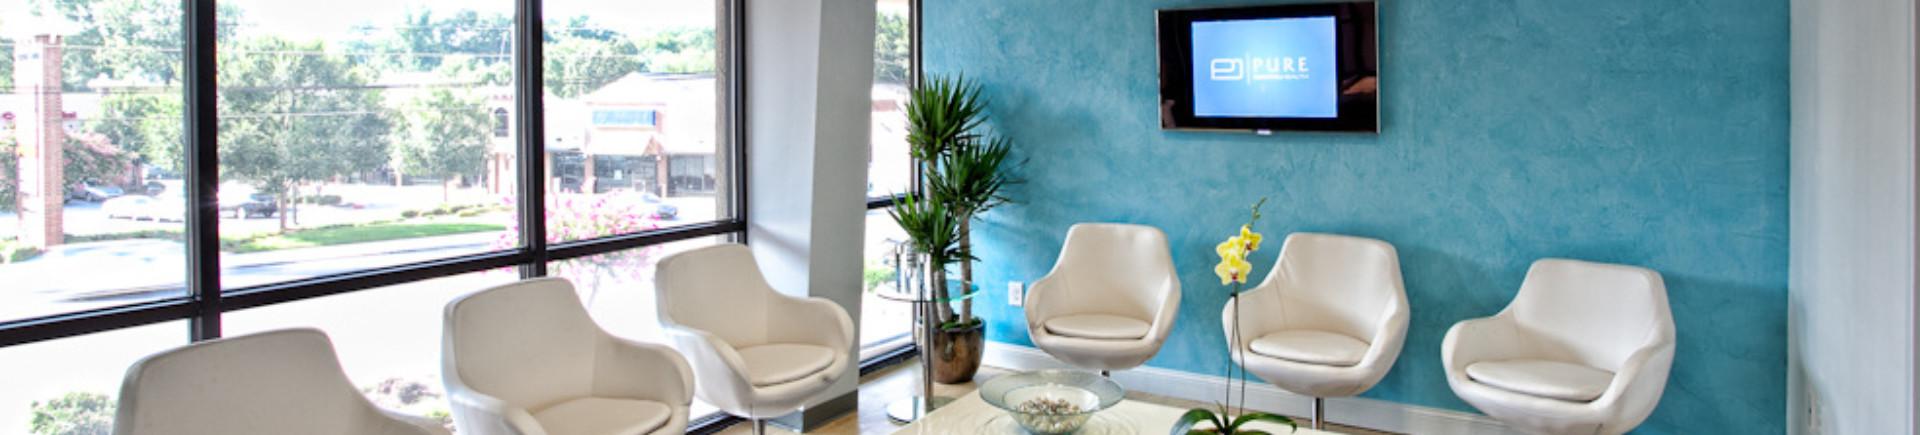 Pure dental health office